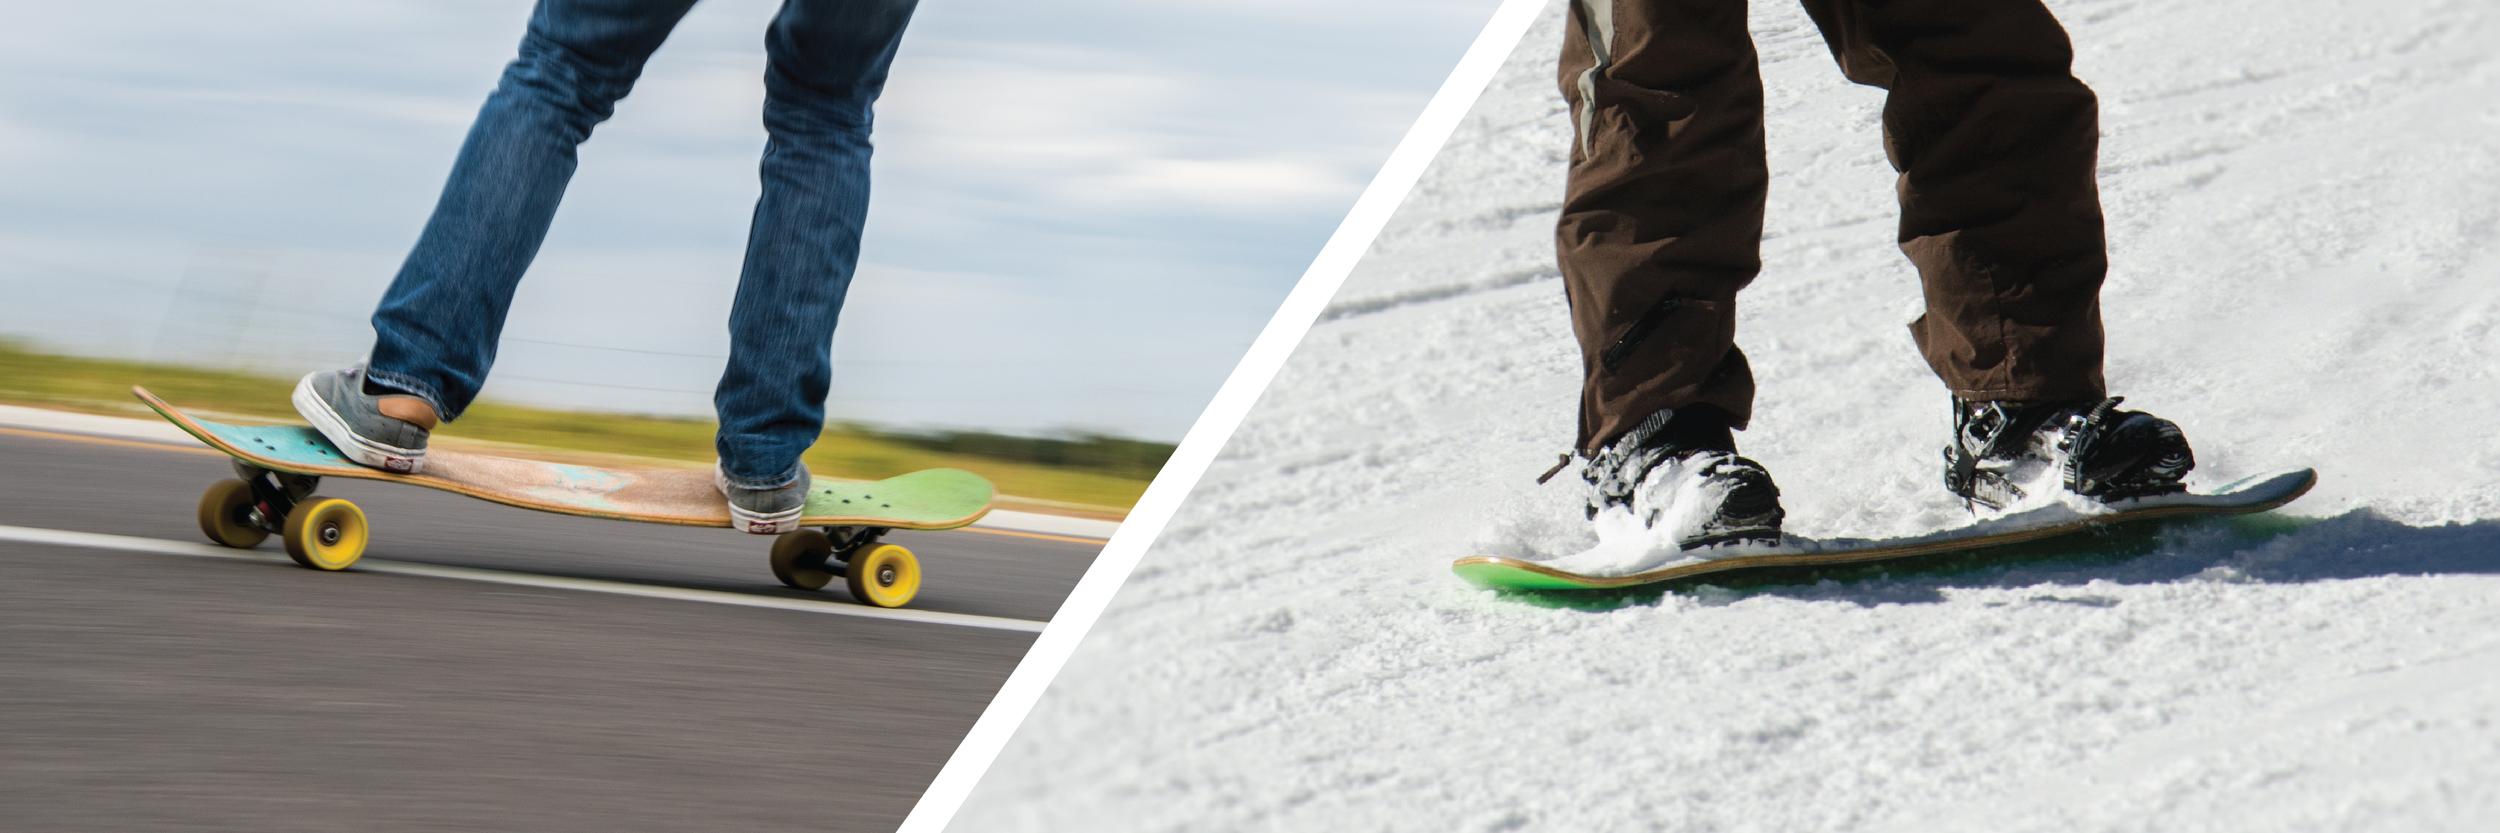 seasons_boards_skateboard_snowboard_home